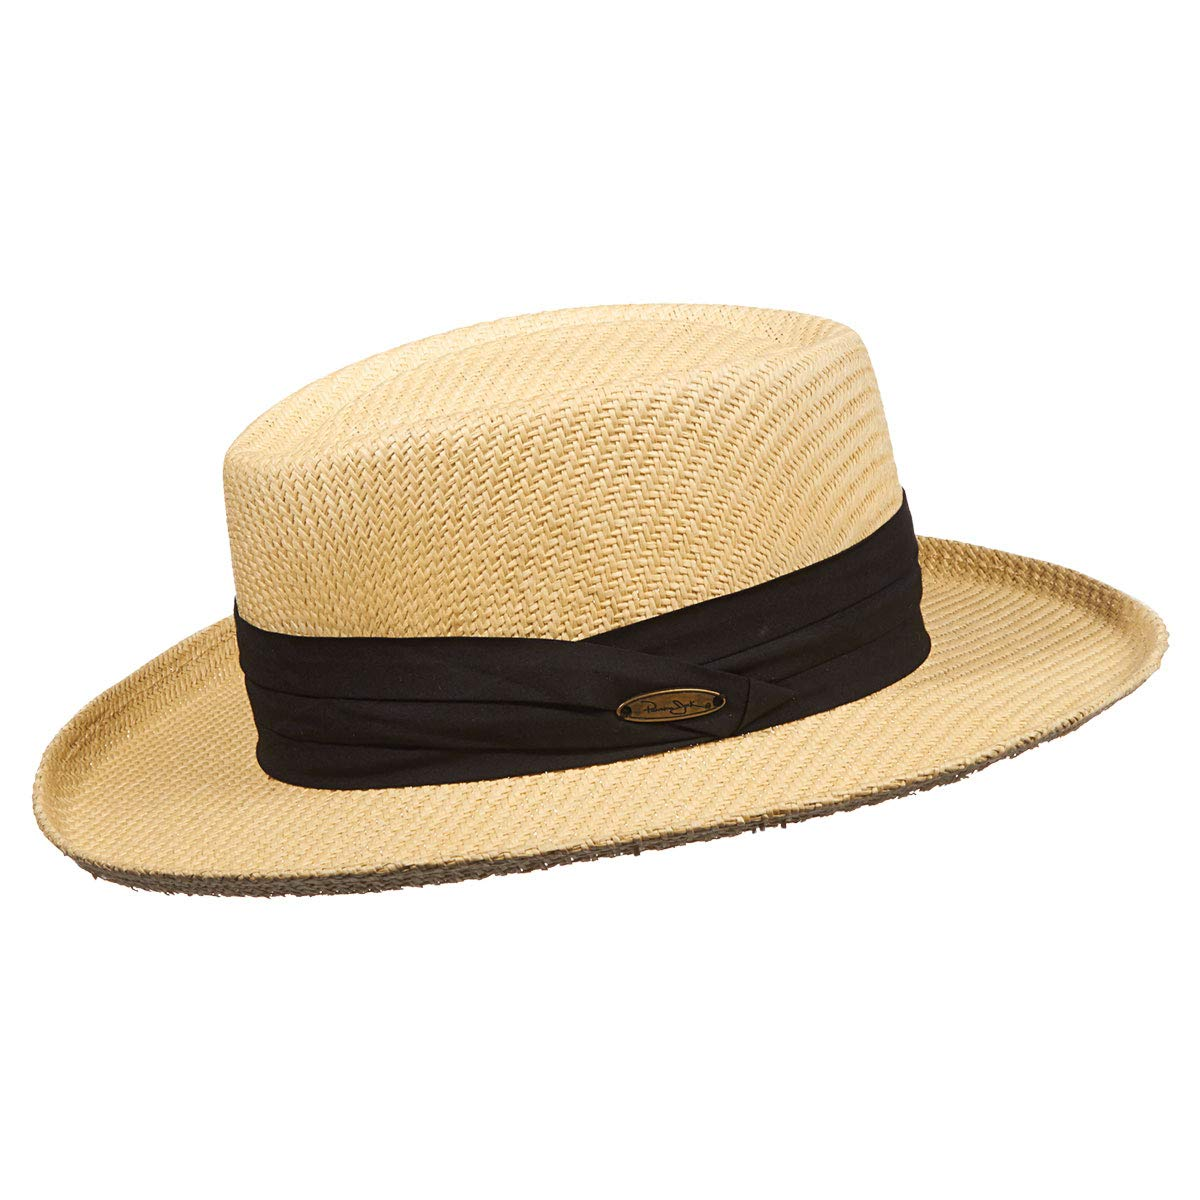 de11b469fc1f9e Amazon.com: Panama Jack Gambler Straw Hat - Lightweight, 3